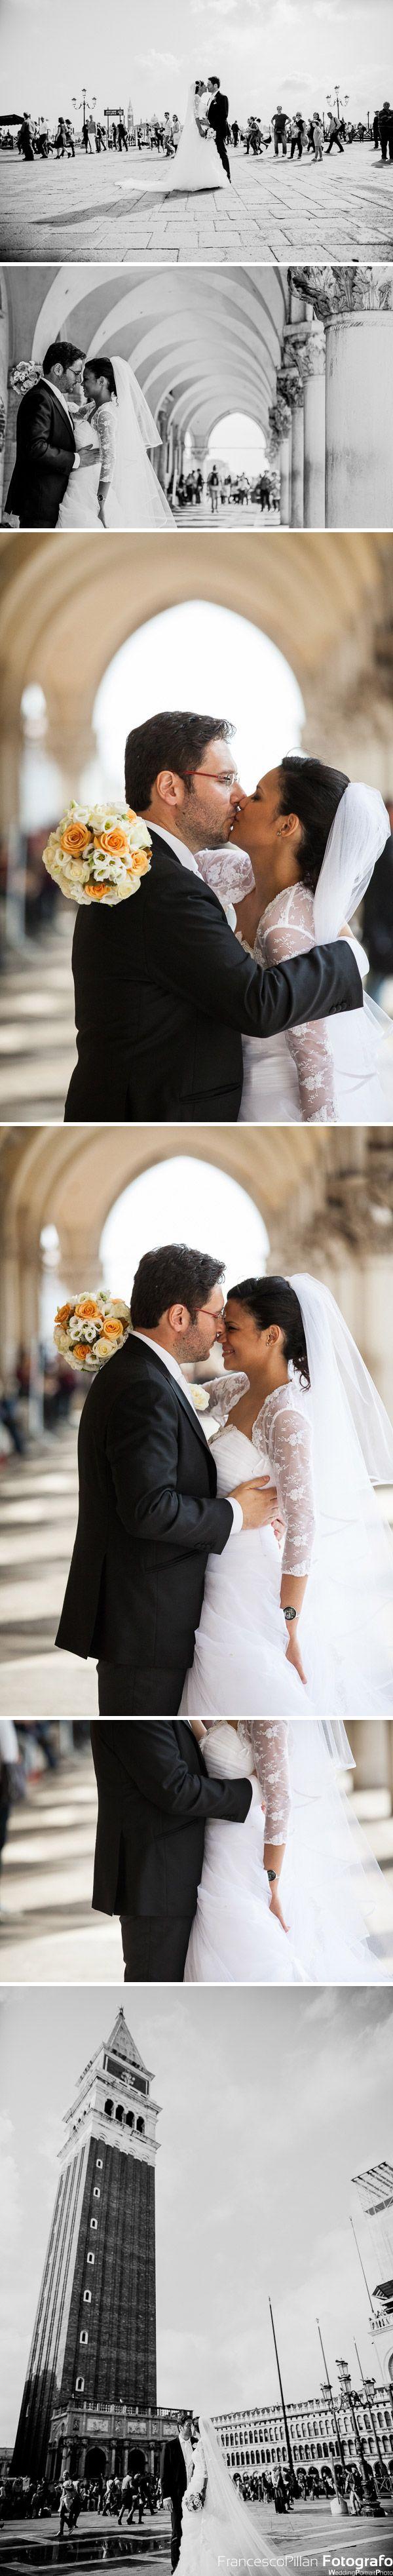 matrimonio venezia piazza san marco